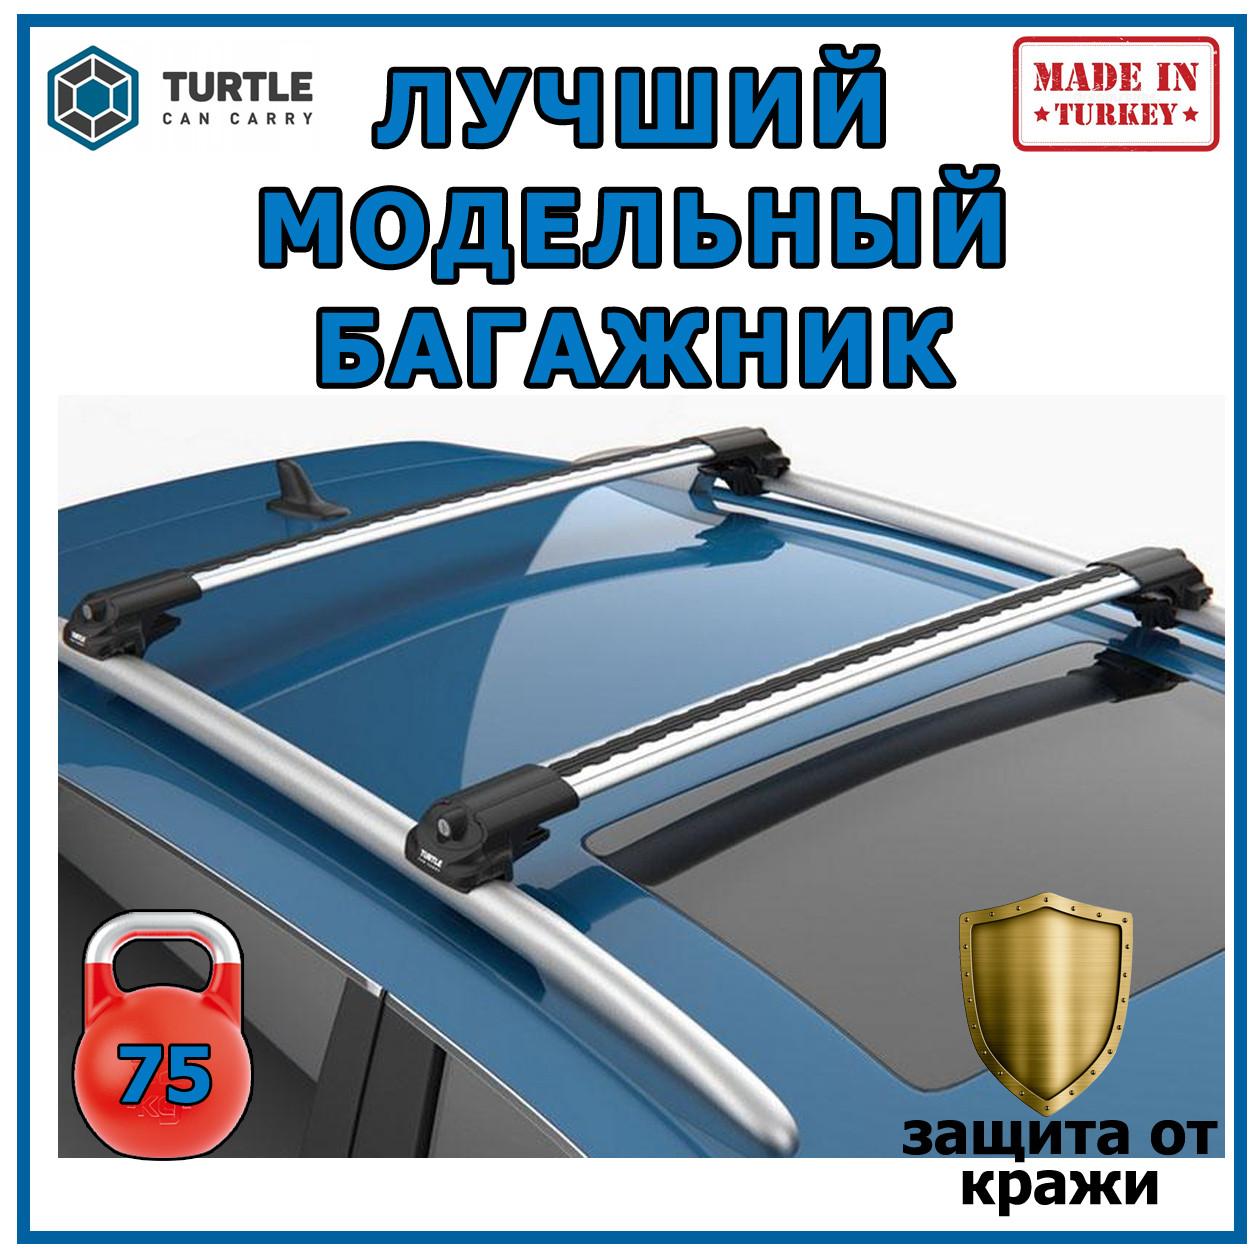 Багажник на дах Mercedes GLK-CLASS 2009-2015 на рейлінги сірий Turtle